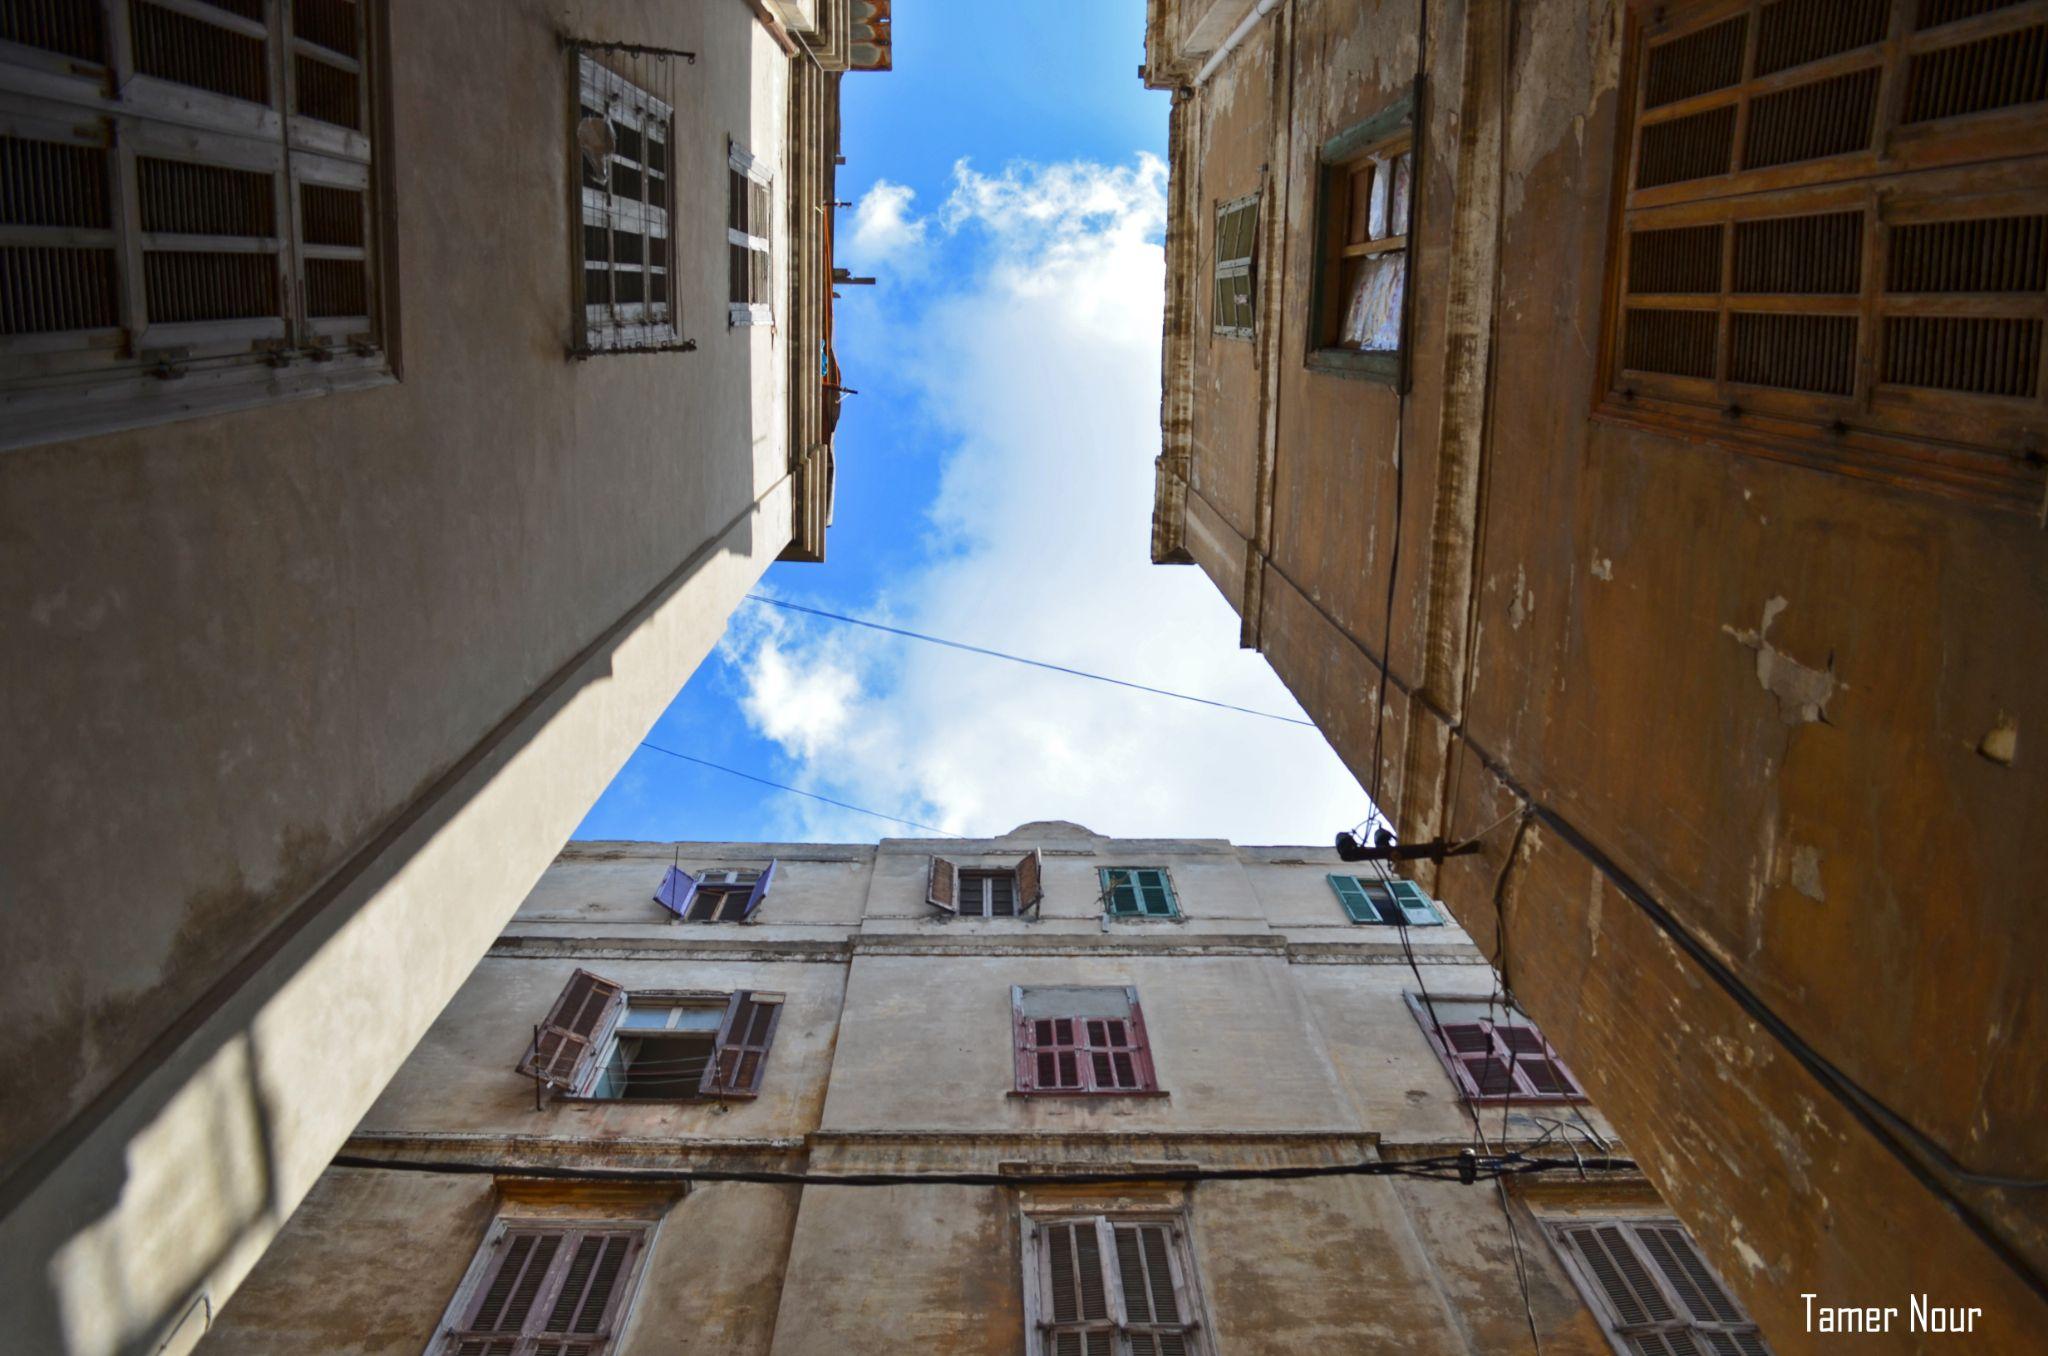 Sky by Tamer Nour